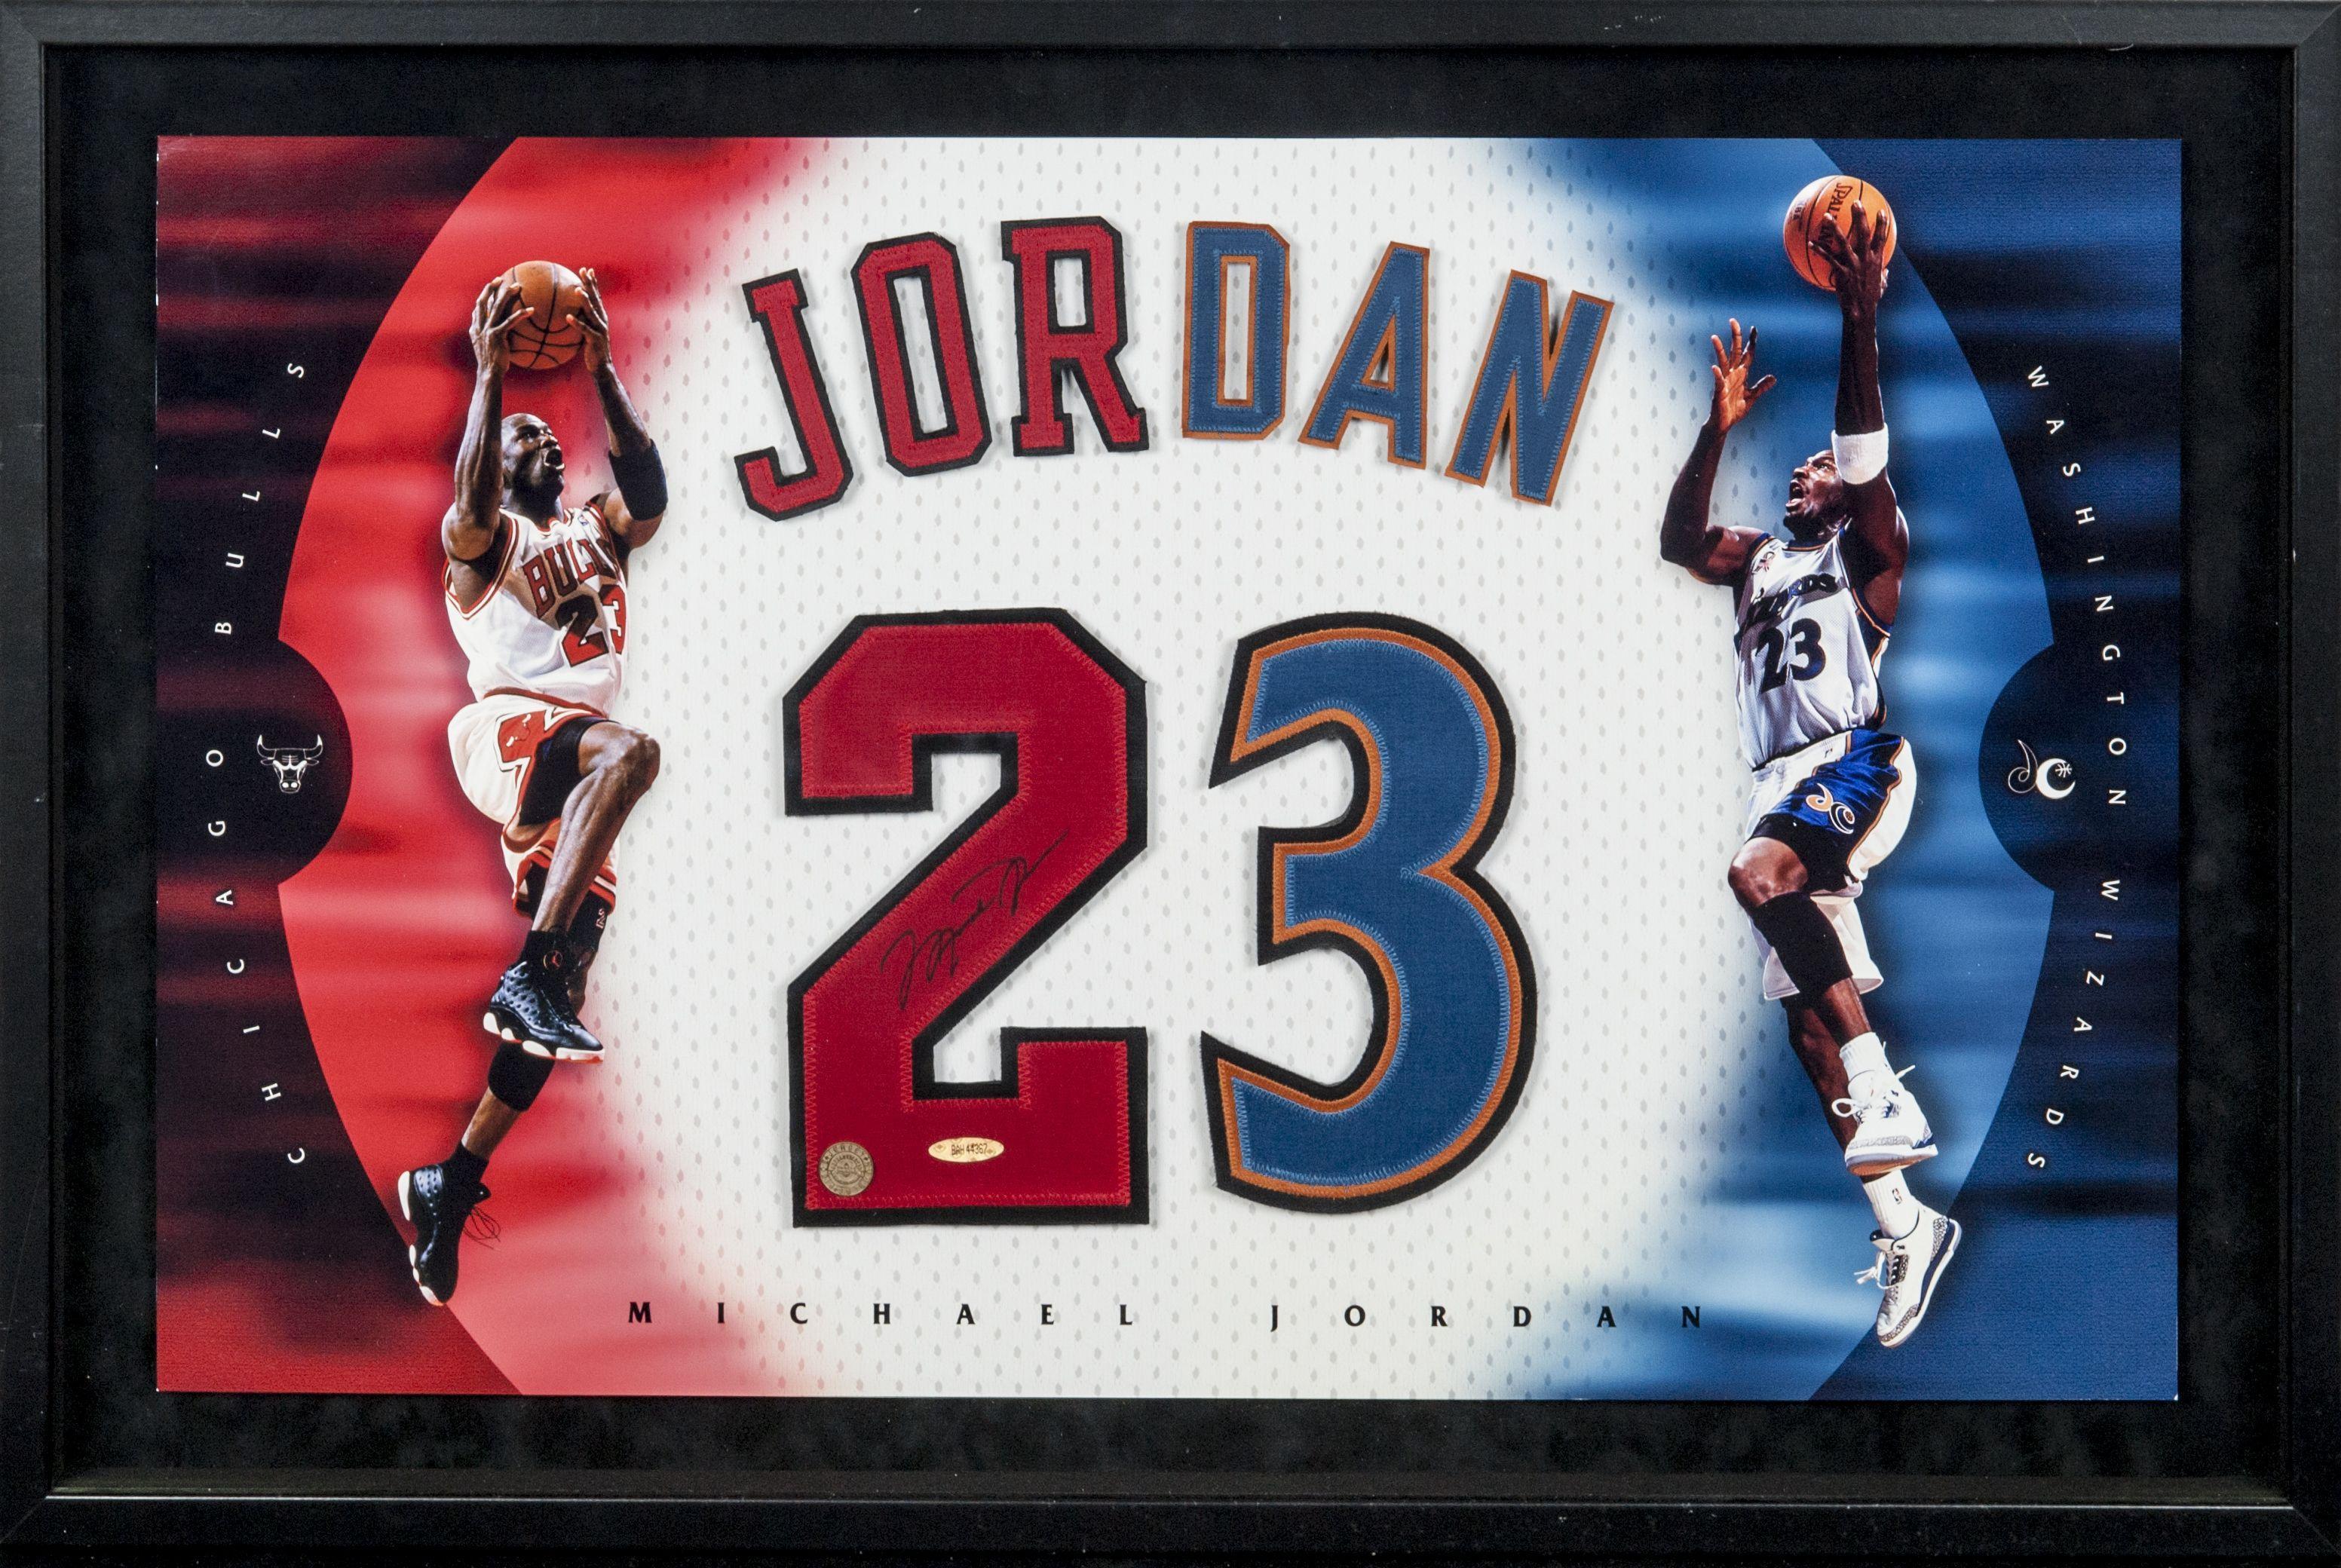 Michael Jordan Number 23 Logo - LogoDix